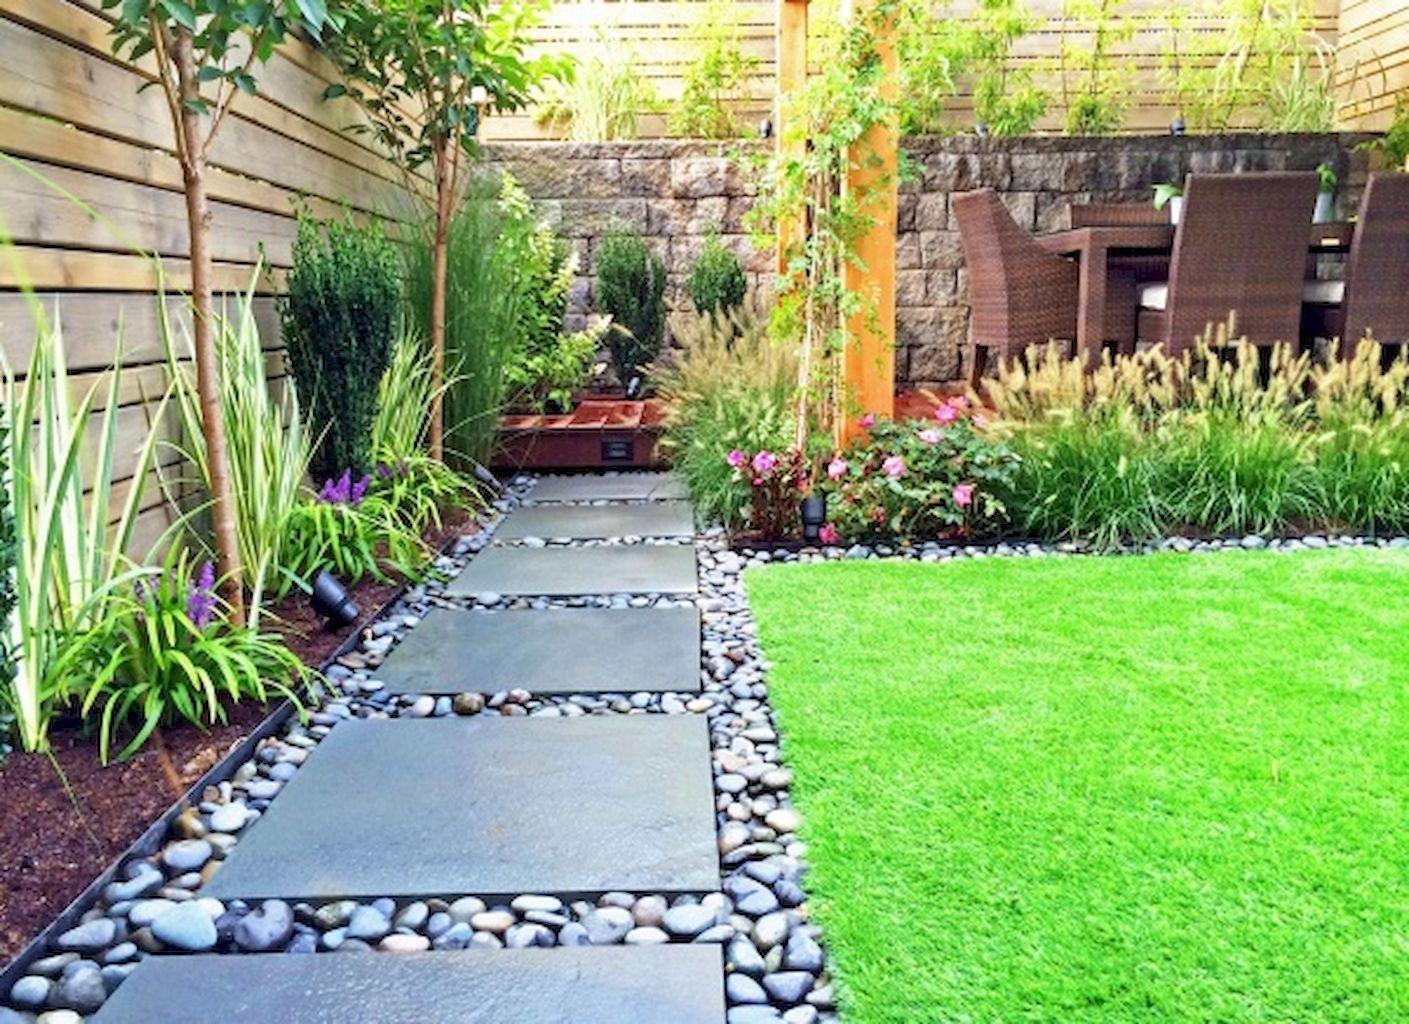 beautiful small backyard landscaping ideas 17 con on gorgeous small backyard landscaping ideas with patio design ideas id=50107